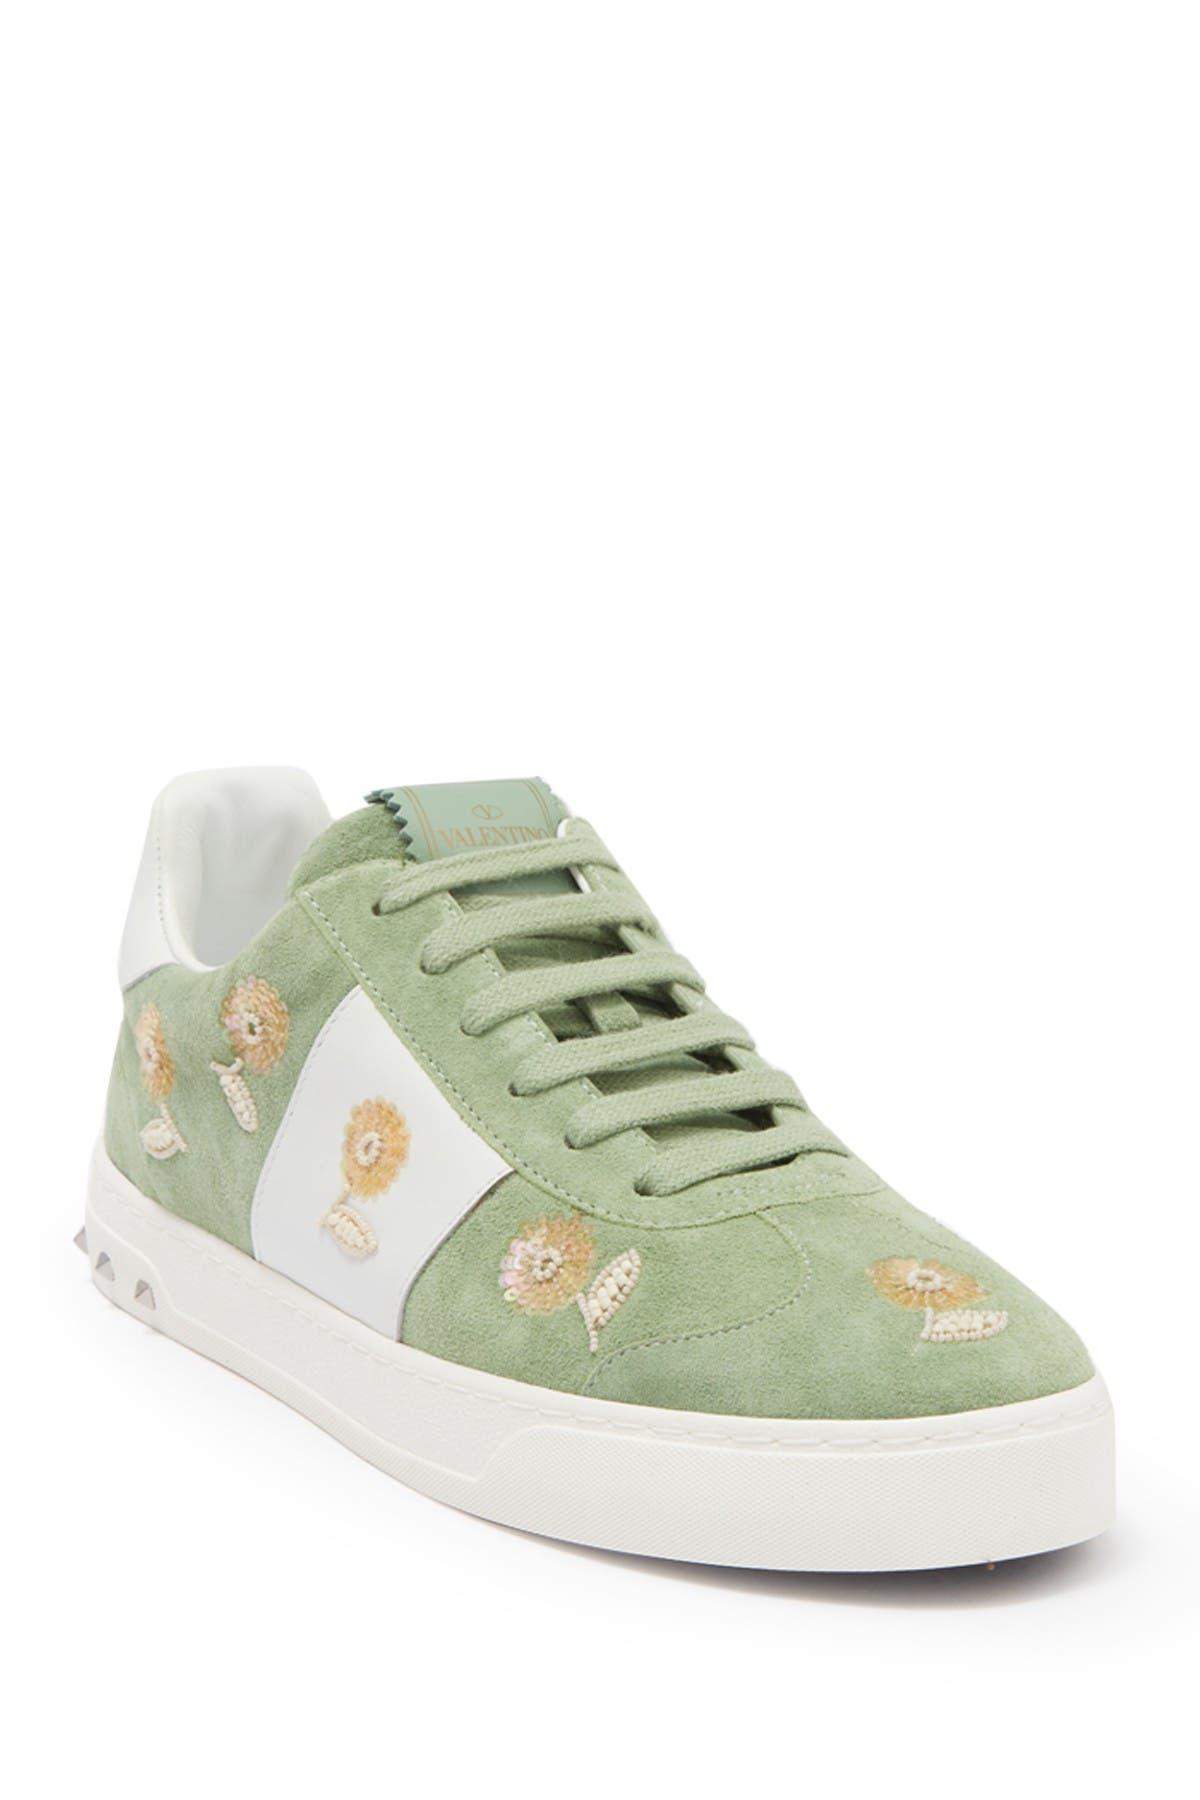 Image of Valentino Floral embellished Suede Sneaker